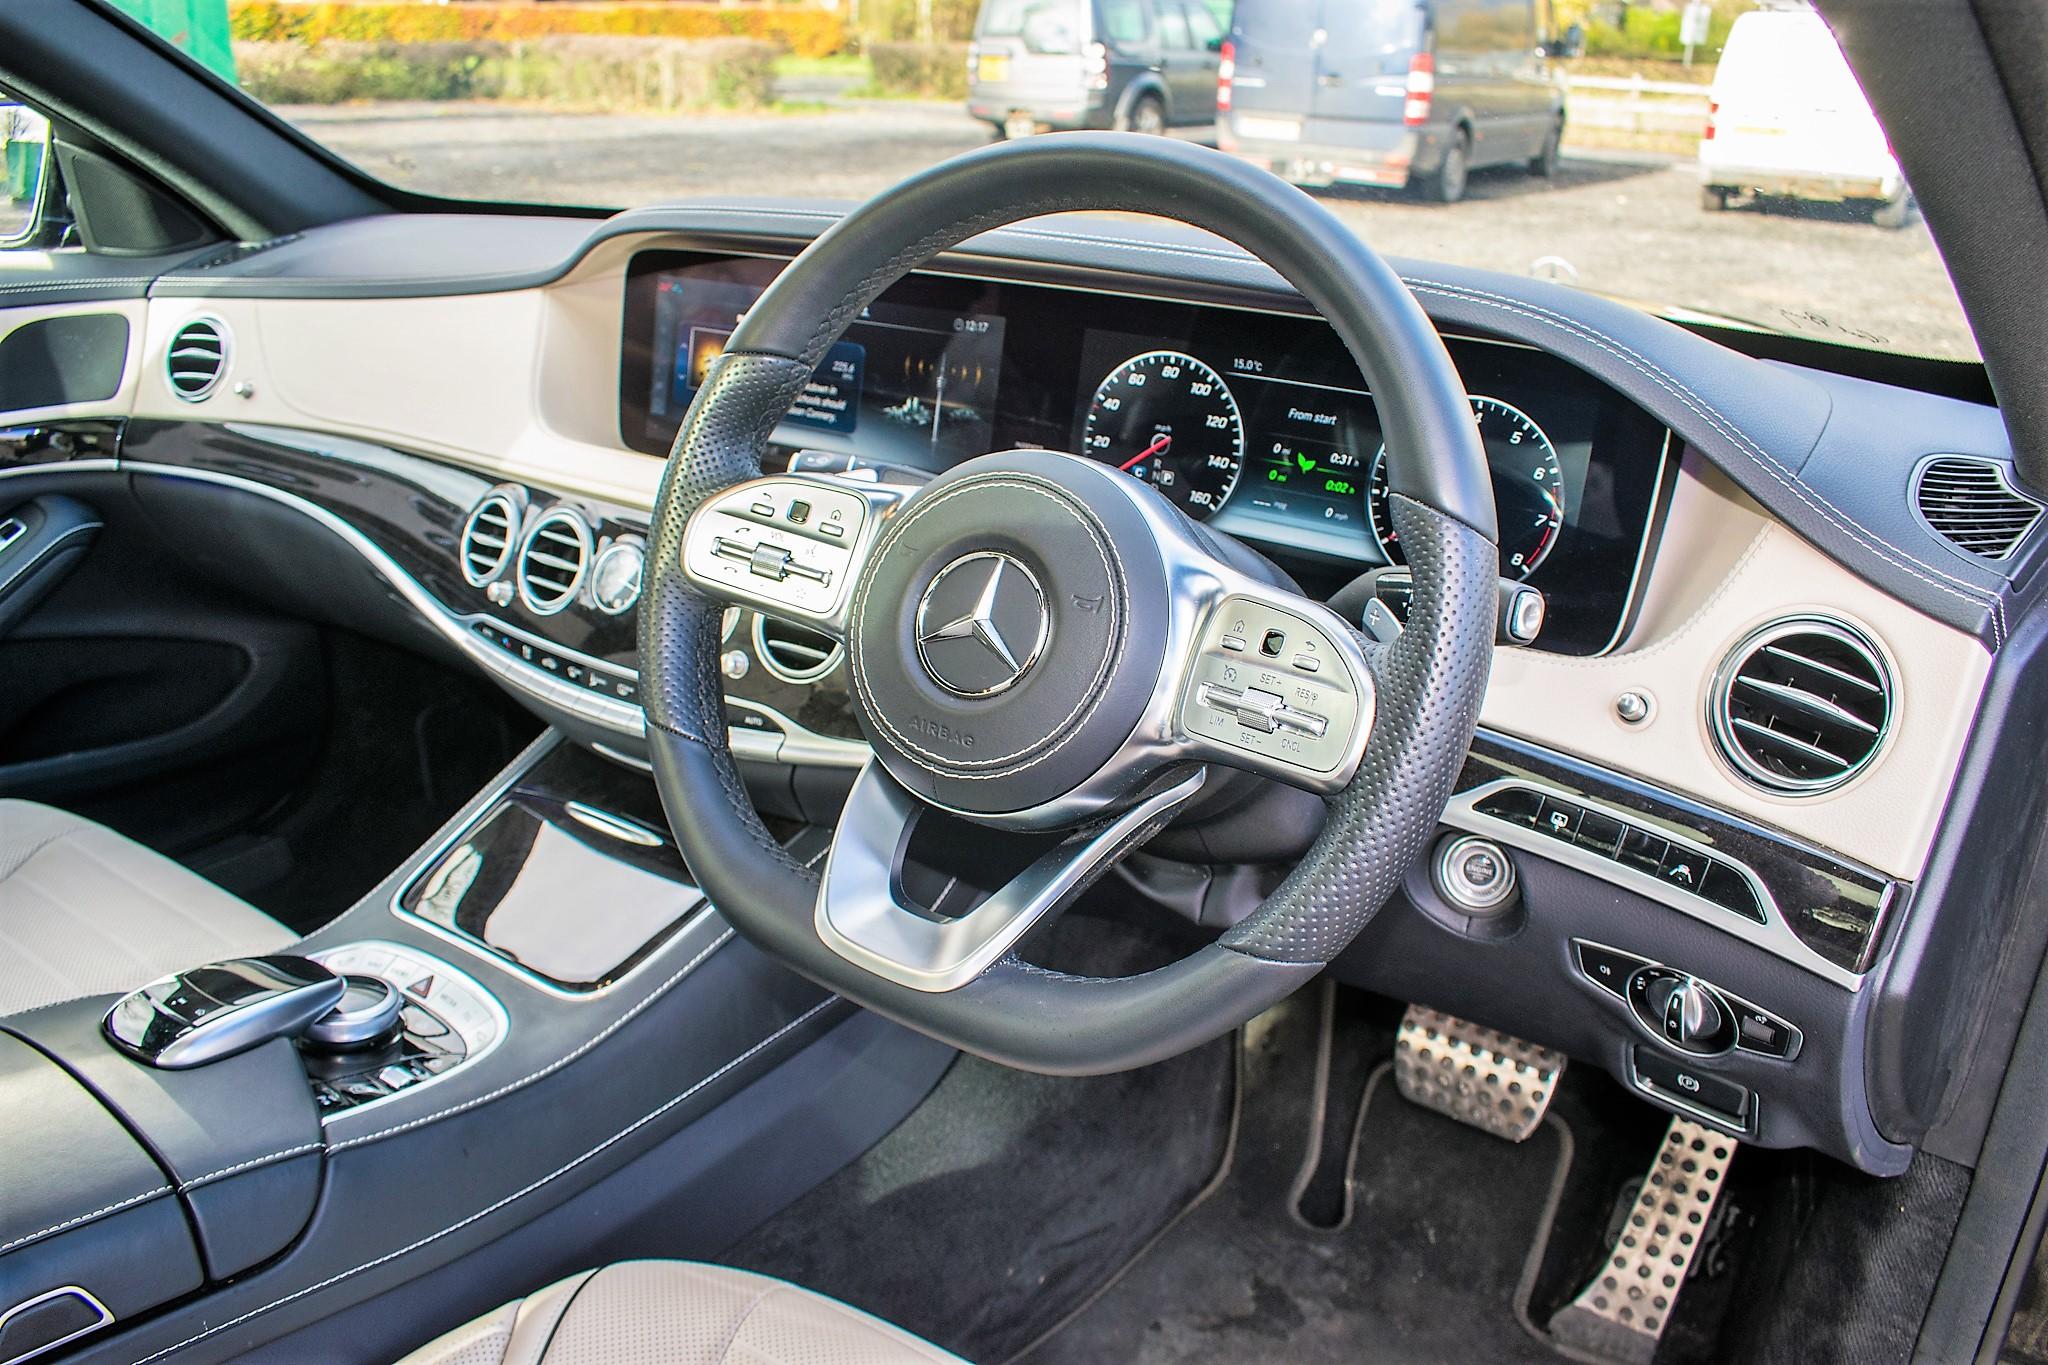 Mercedes Benz S450 L AMG Line Executive auto petrol 4 door saloon car Registration Number: FX68 - Image 27 of 30